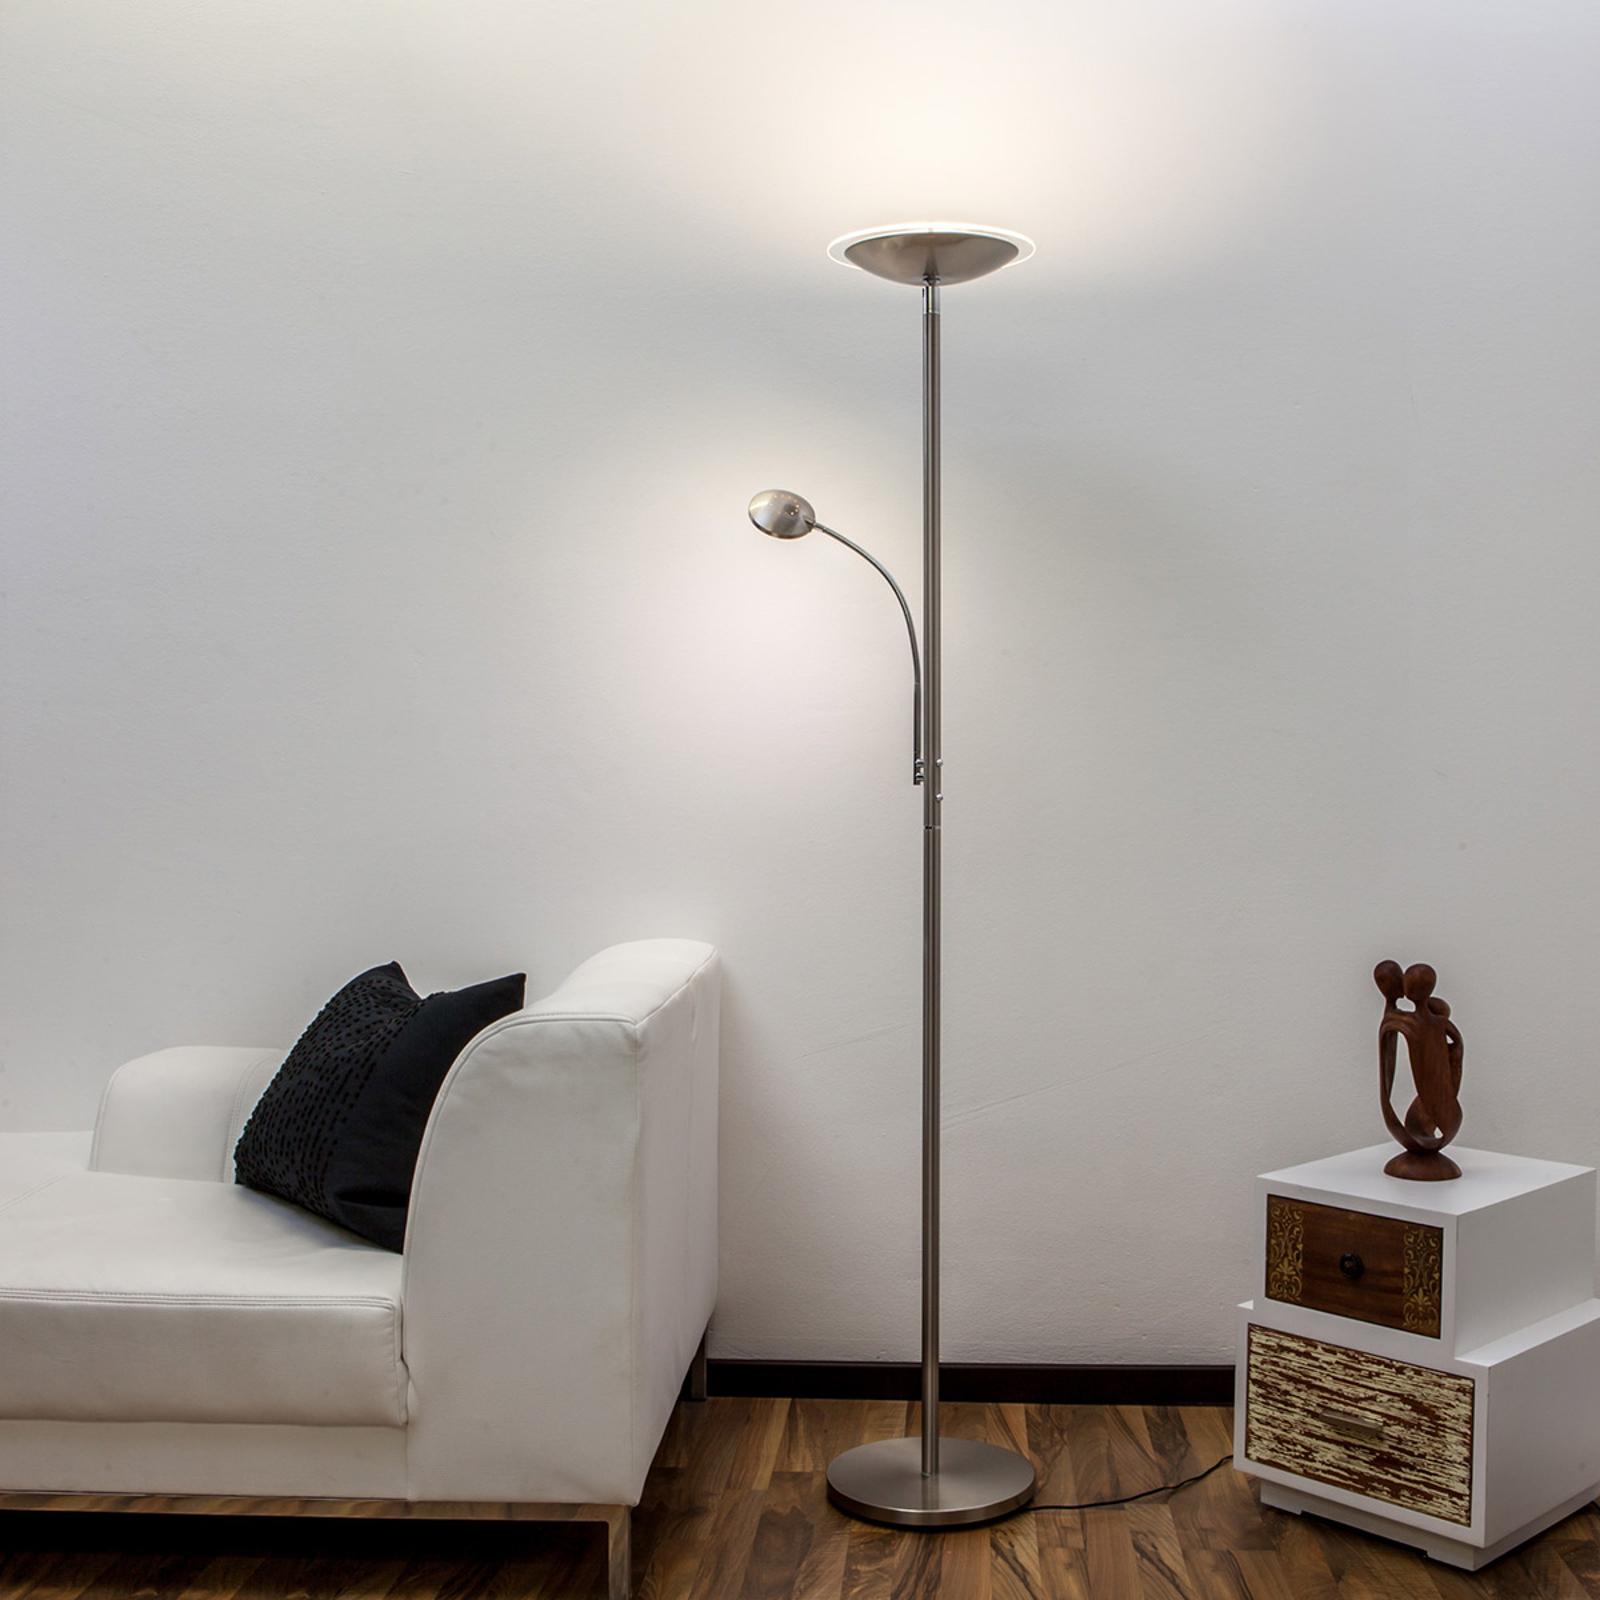 Lampa stojąca Malea LED, nikiel